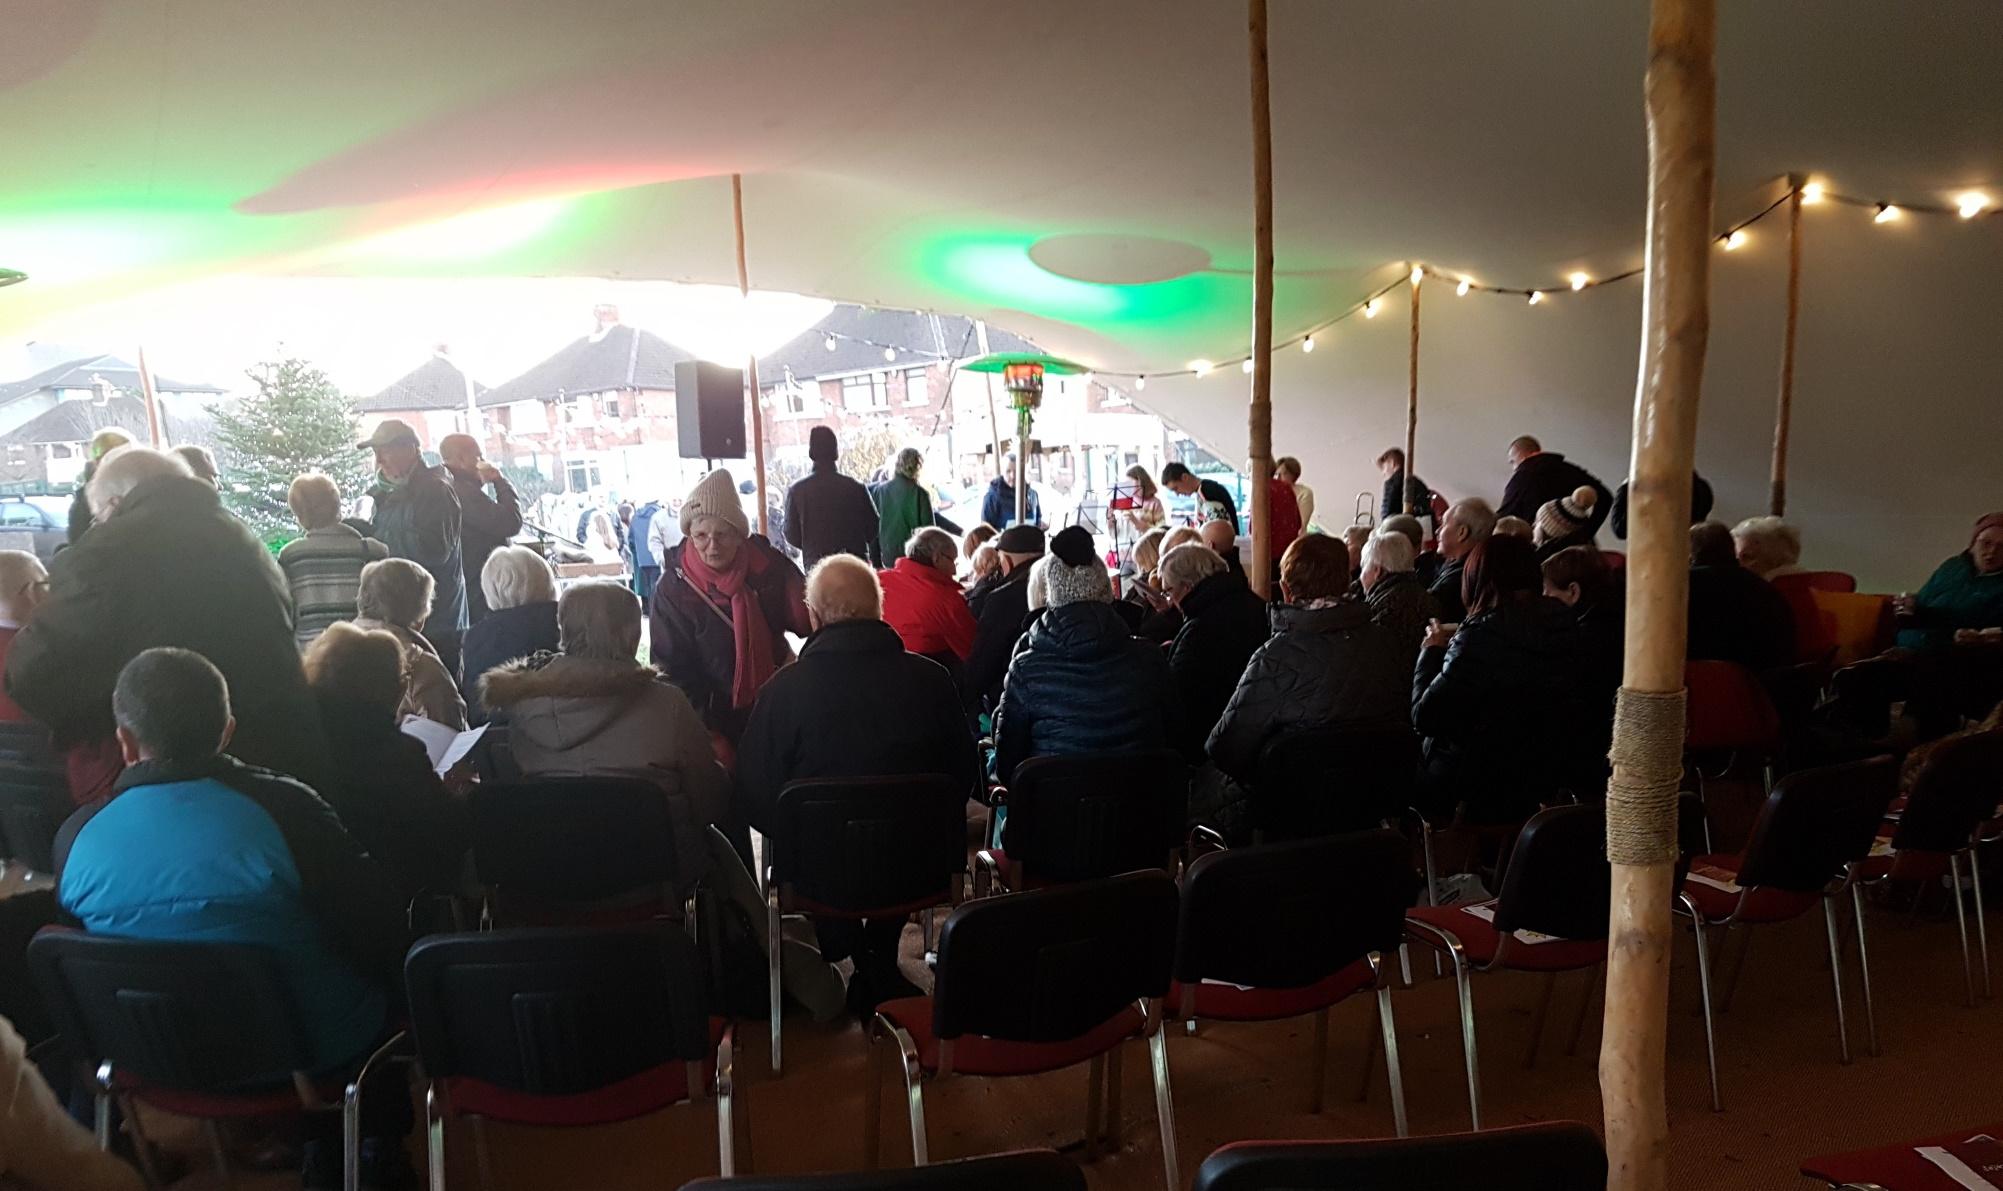 All Church, Community and Charitable work by Knockbreda Methodist Church fundraising photo 5